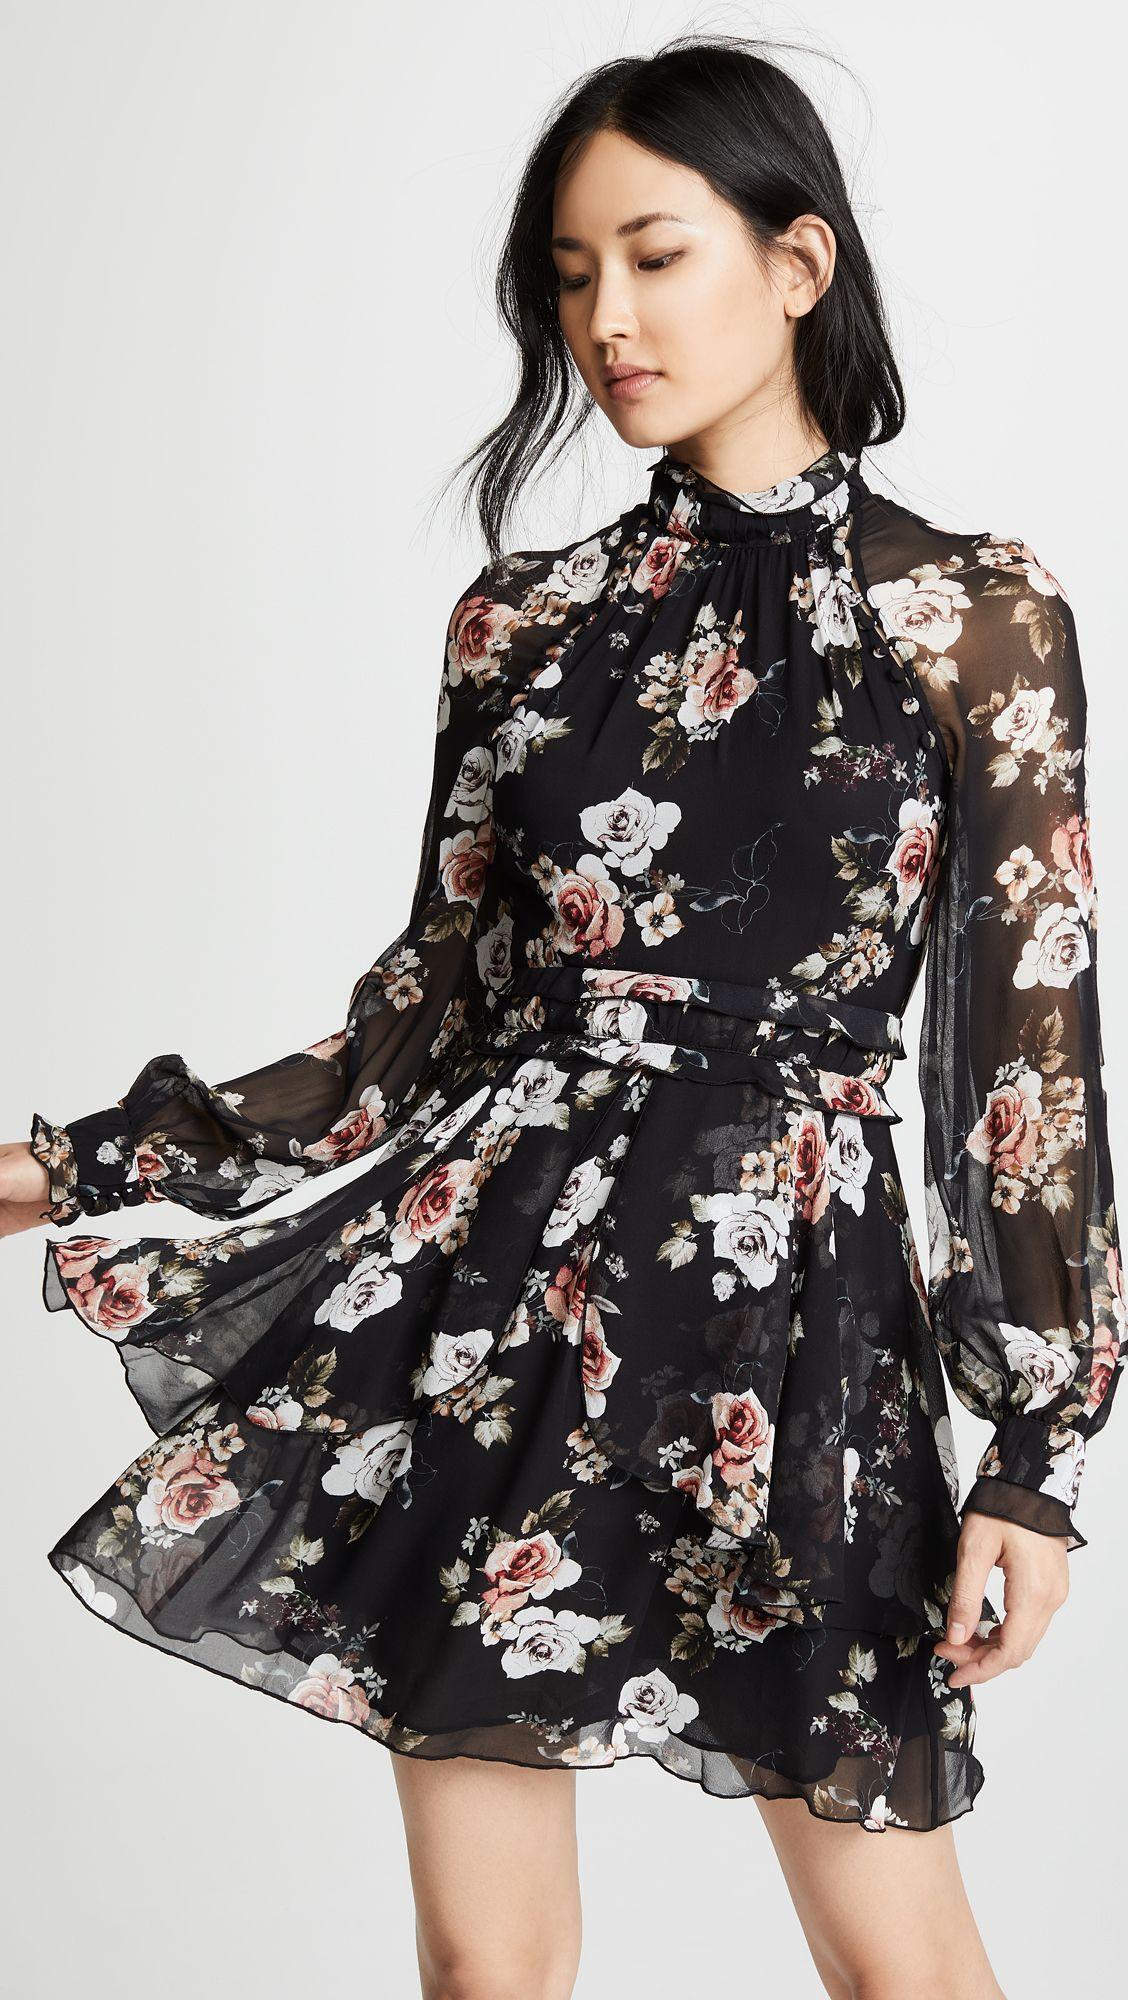 Nicholas High Neck Mini Dress Floral Mini Dress Outfit Buy Floral Dress Mini Dress [ 2000 x 1128 Pixel ]